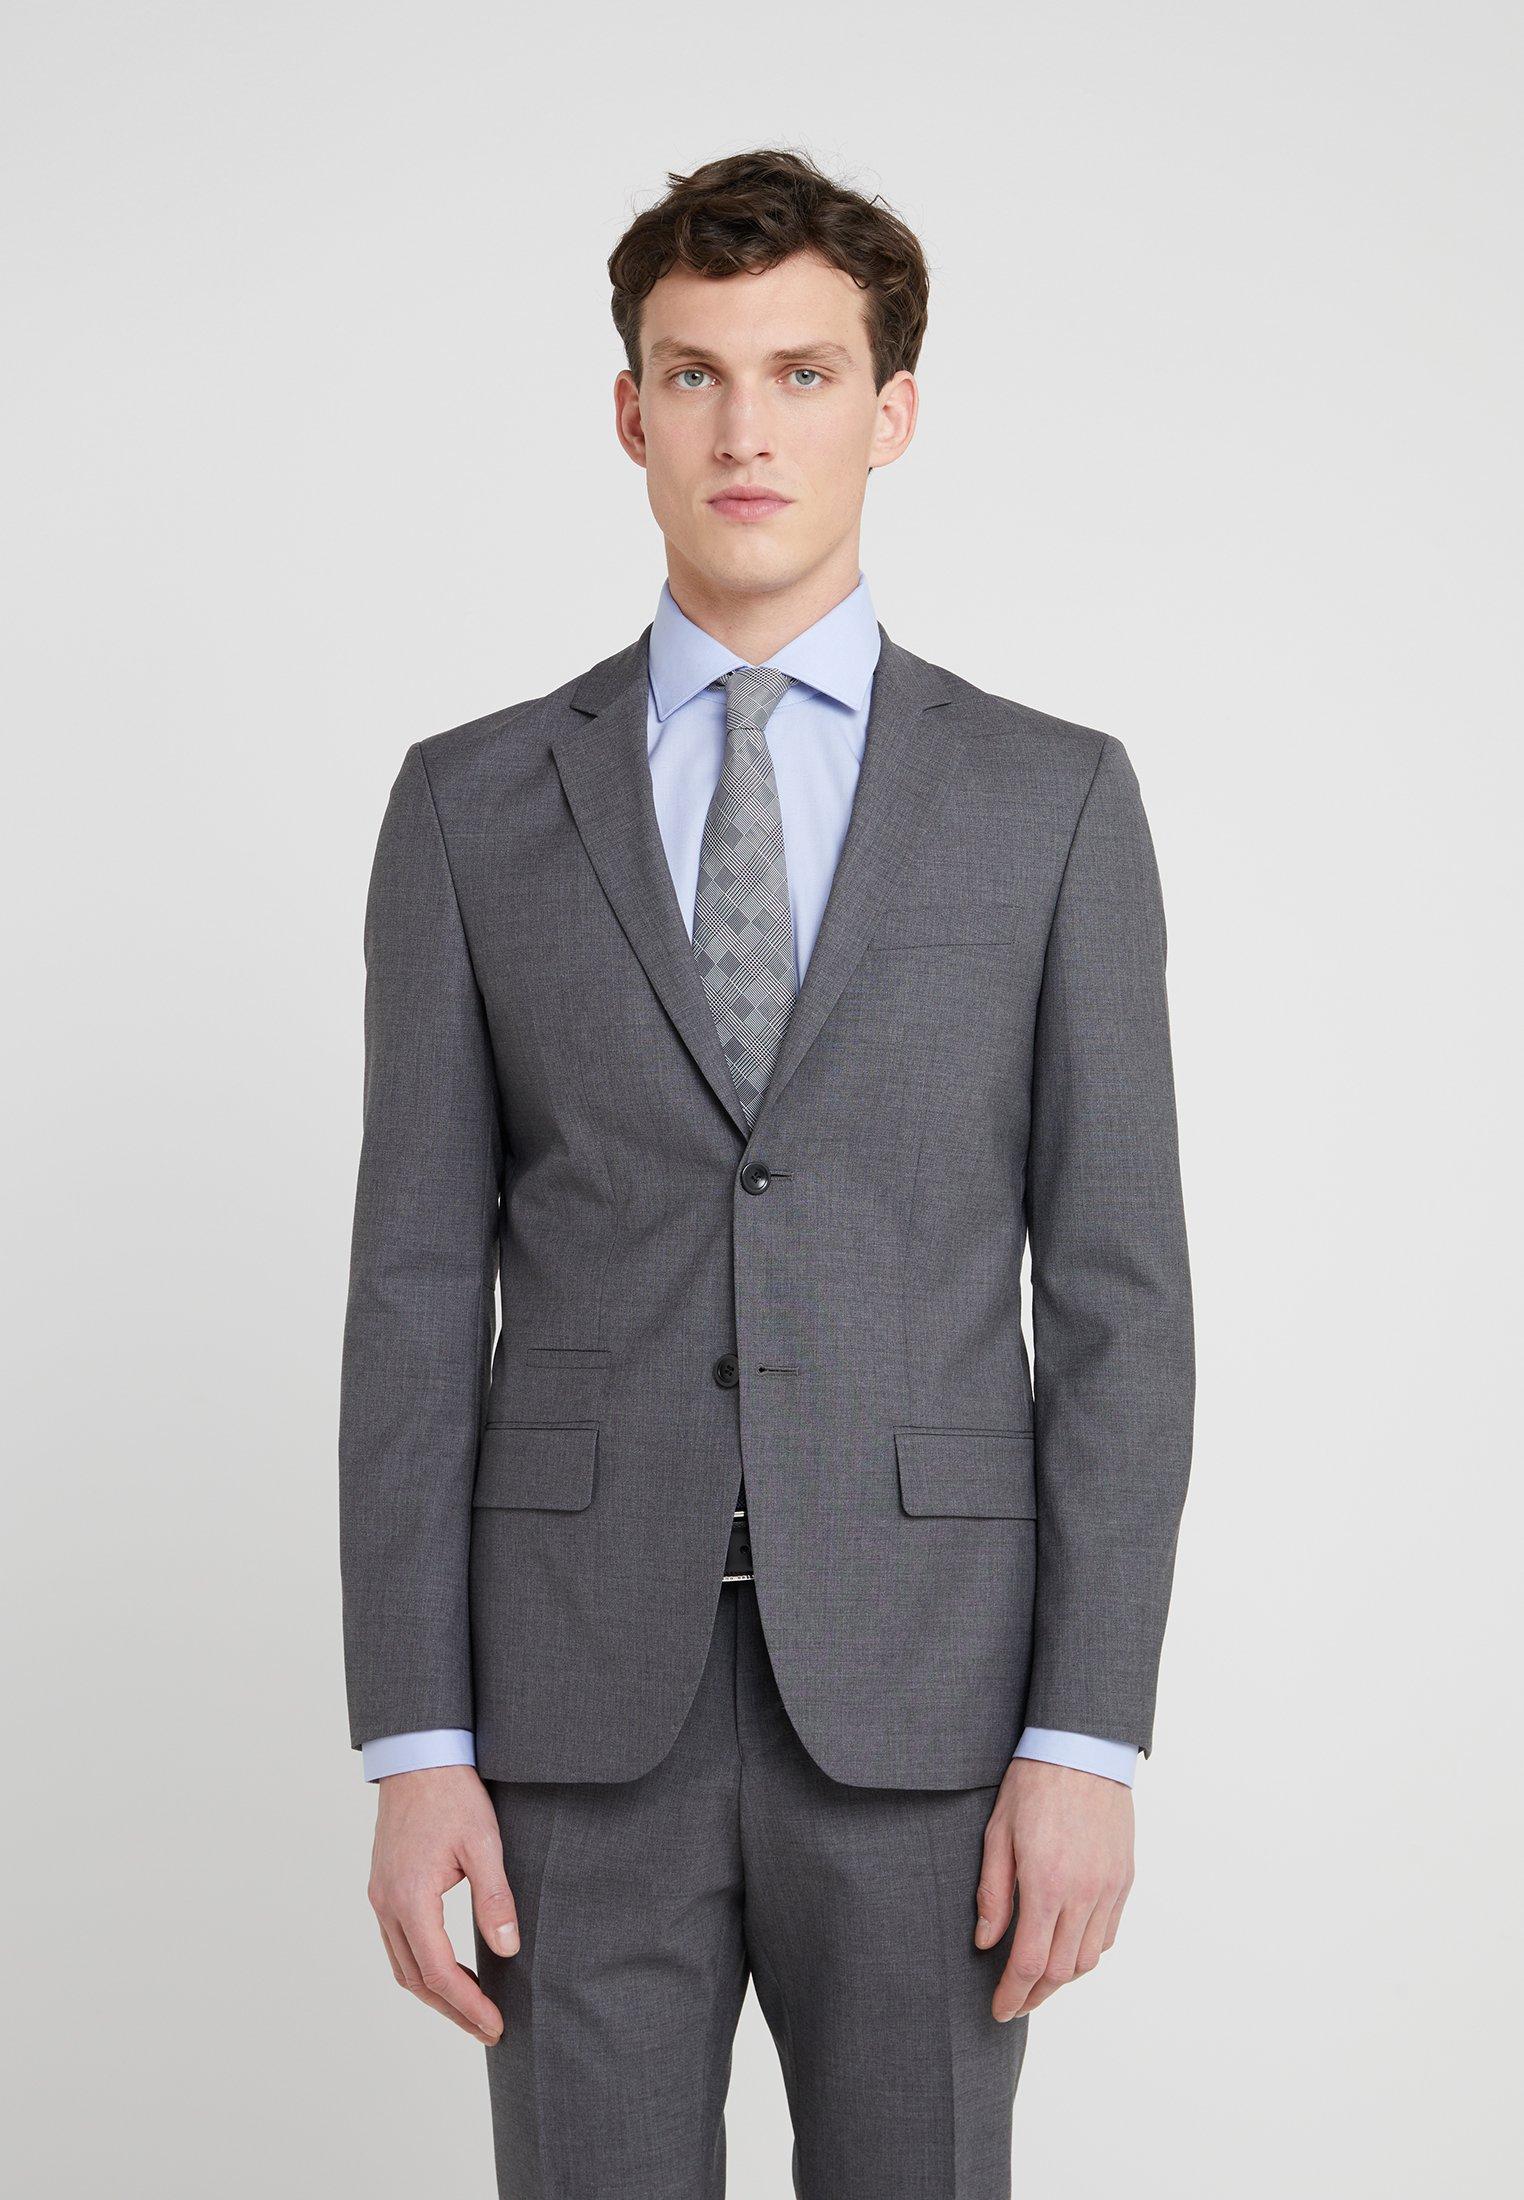 Filippa JacketVeste Melange Cool Costume Rick De K Grey HDIYeWE29b